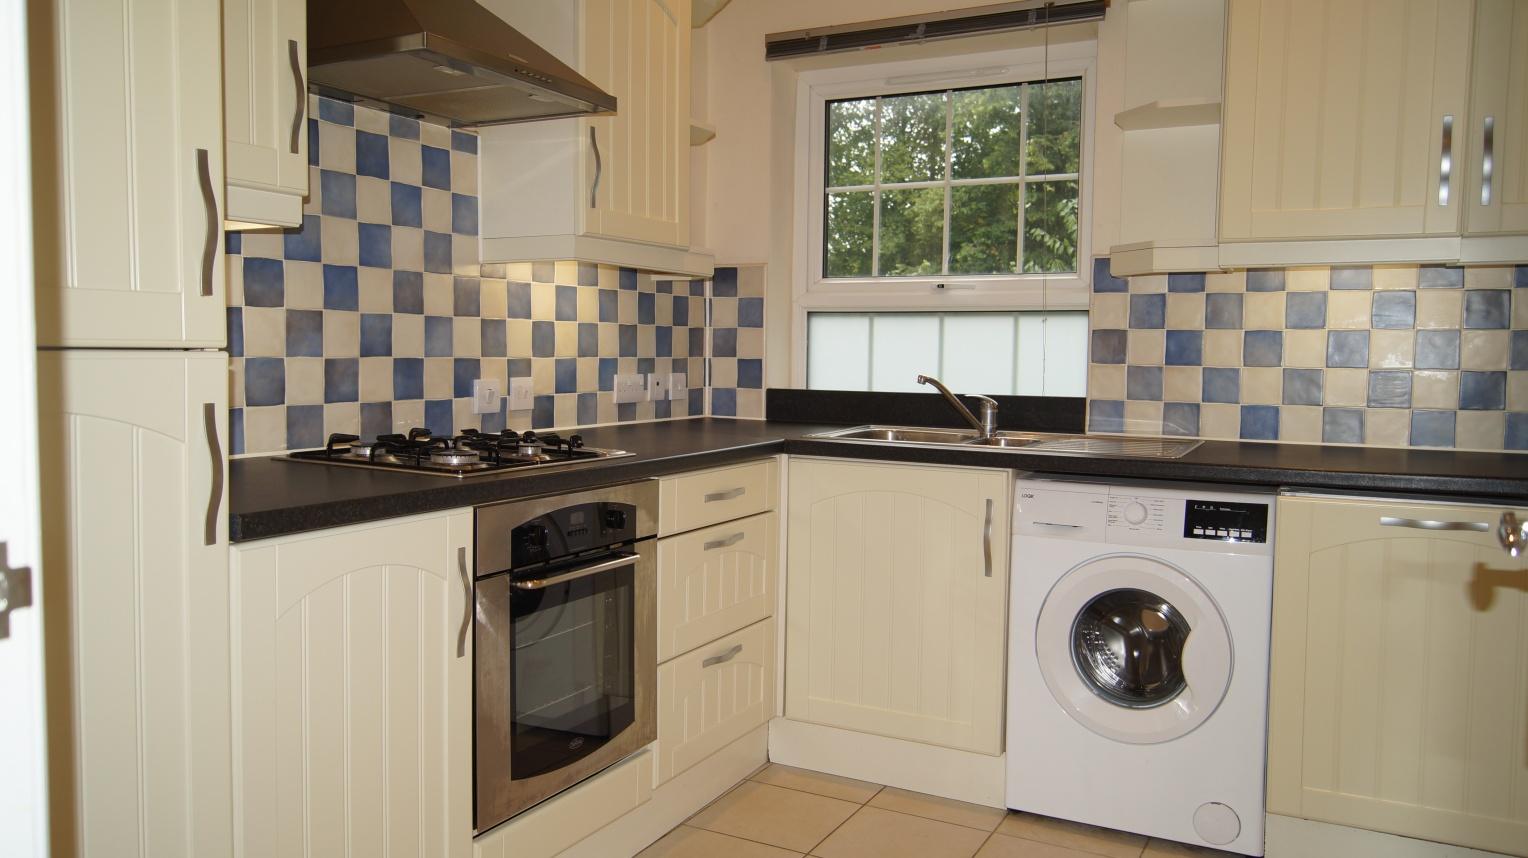 Littleover House, Burton Road, Littleover, Derby, DE23